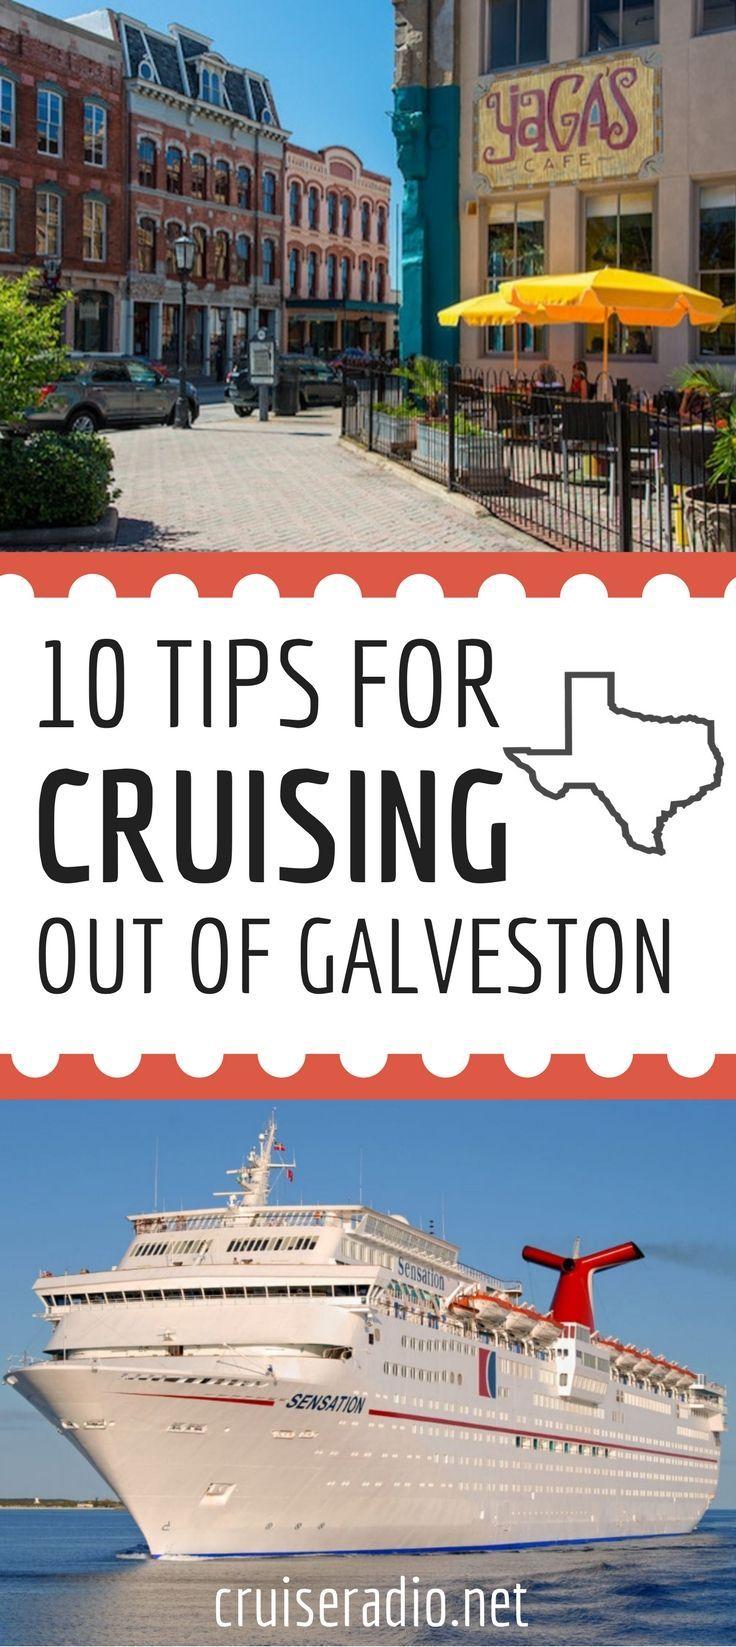 10 Tips for Cruising Out of Galveston Honeymoon cruise